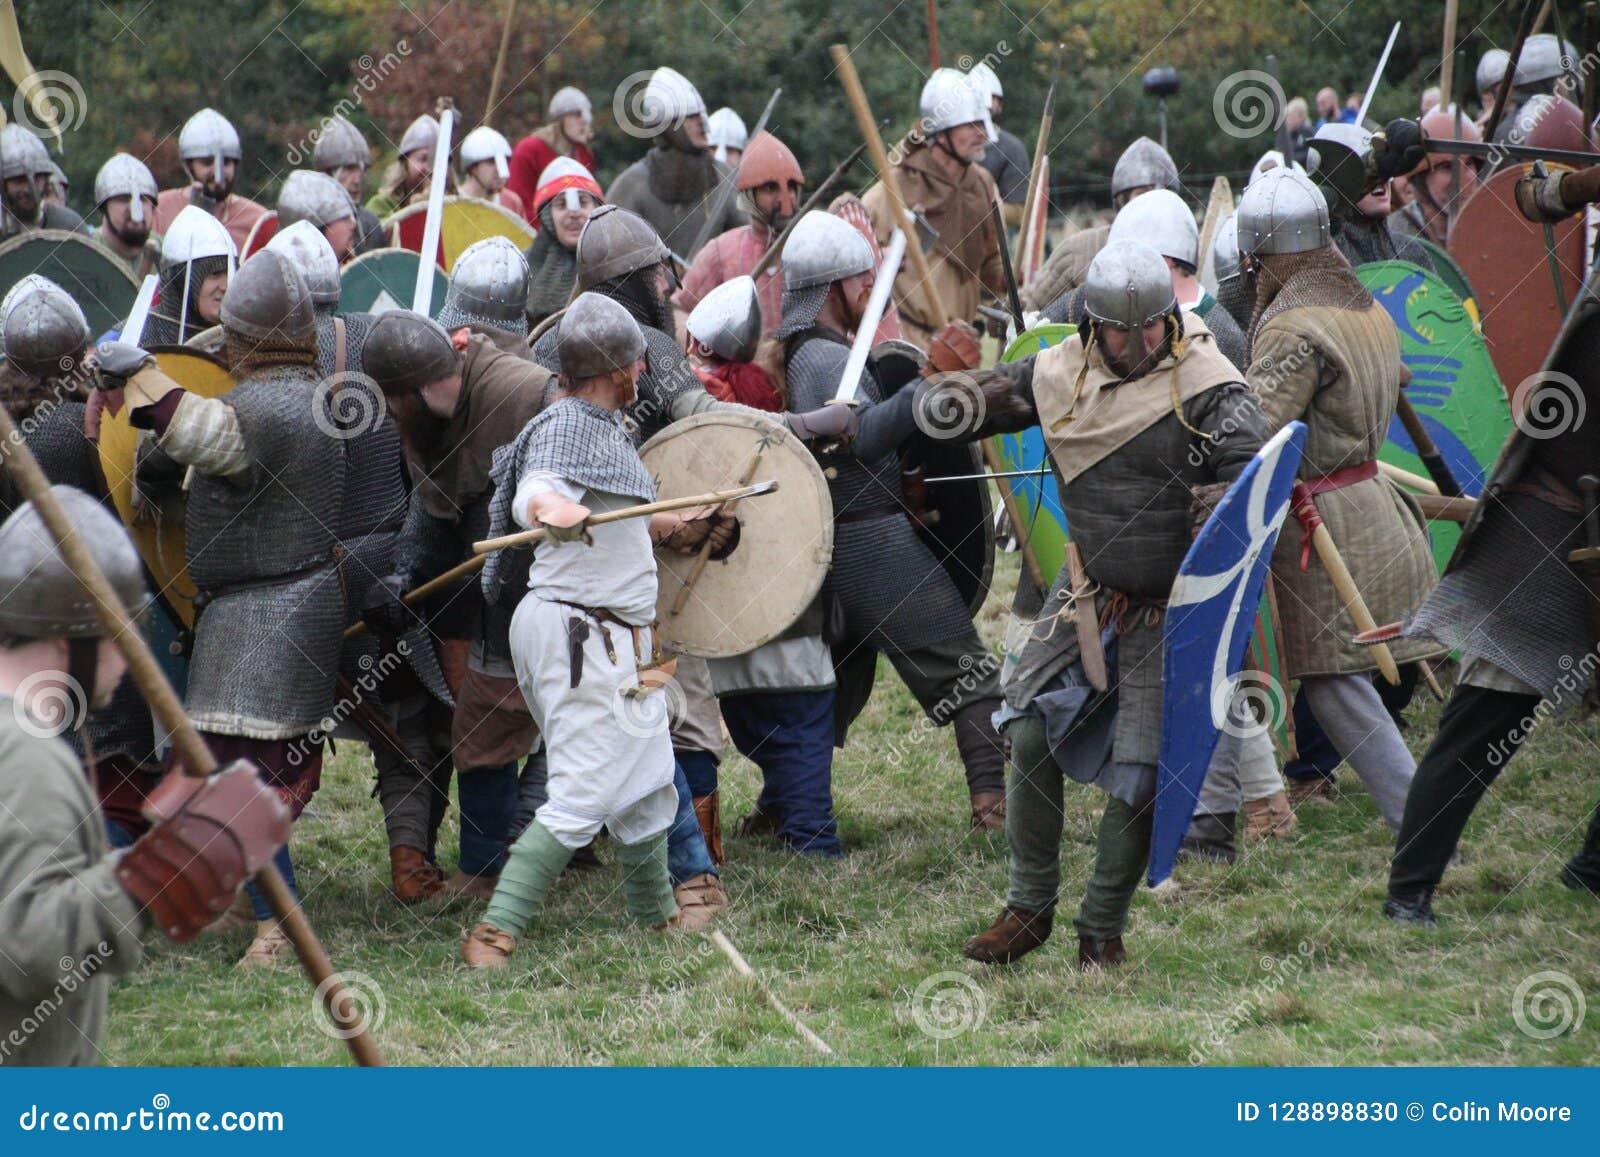 Battle Of Hastings Reenactment Editorial Image - Image of